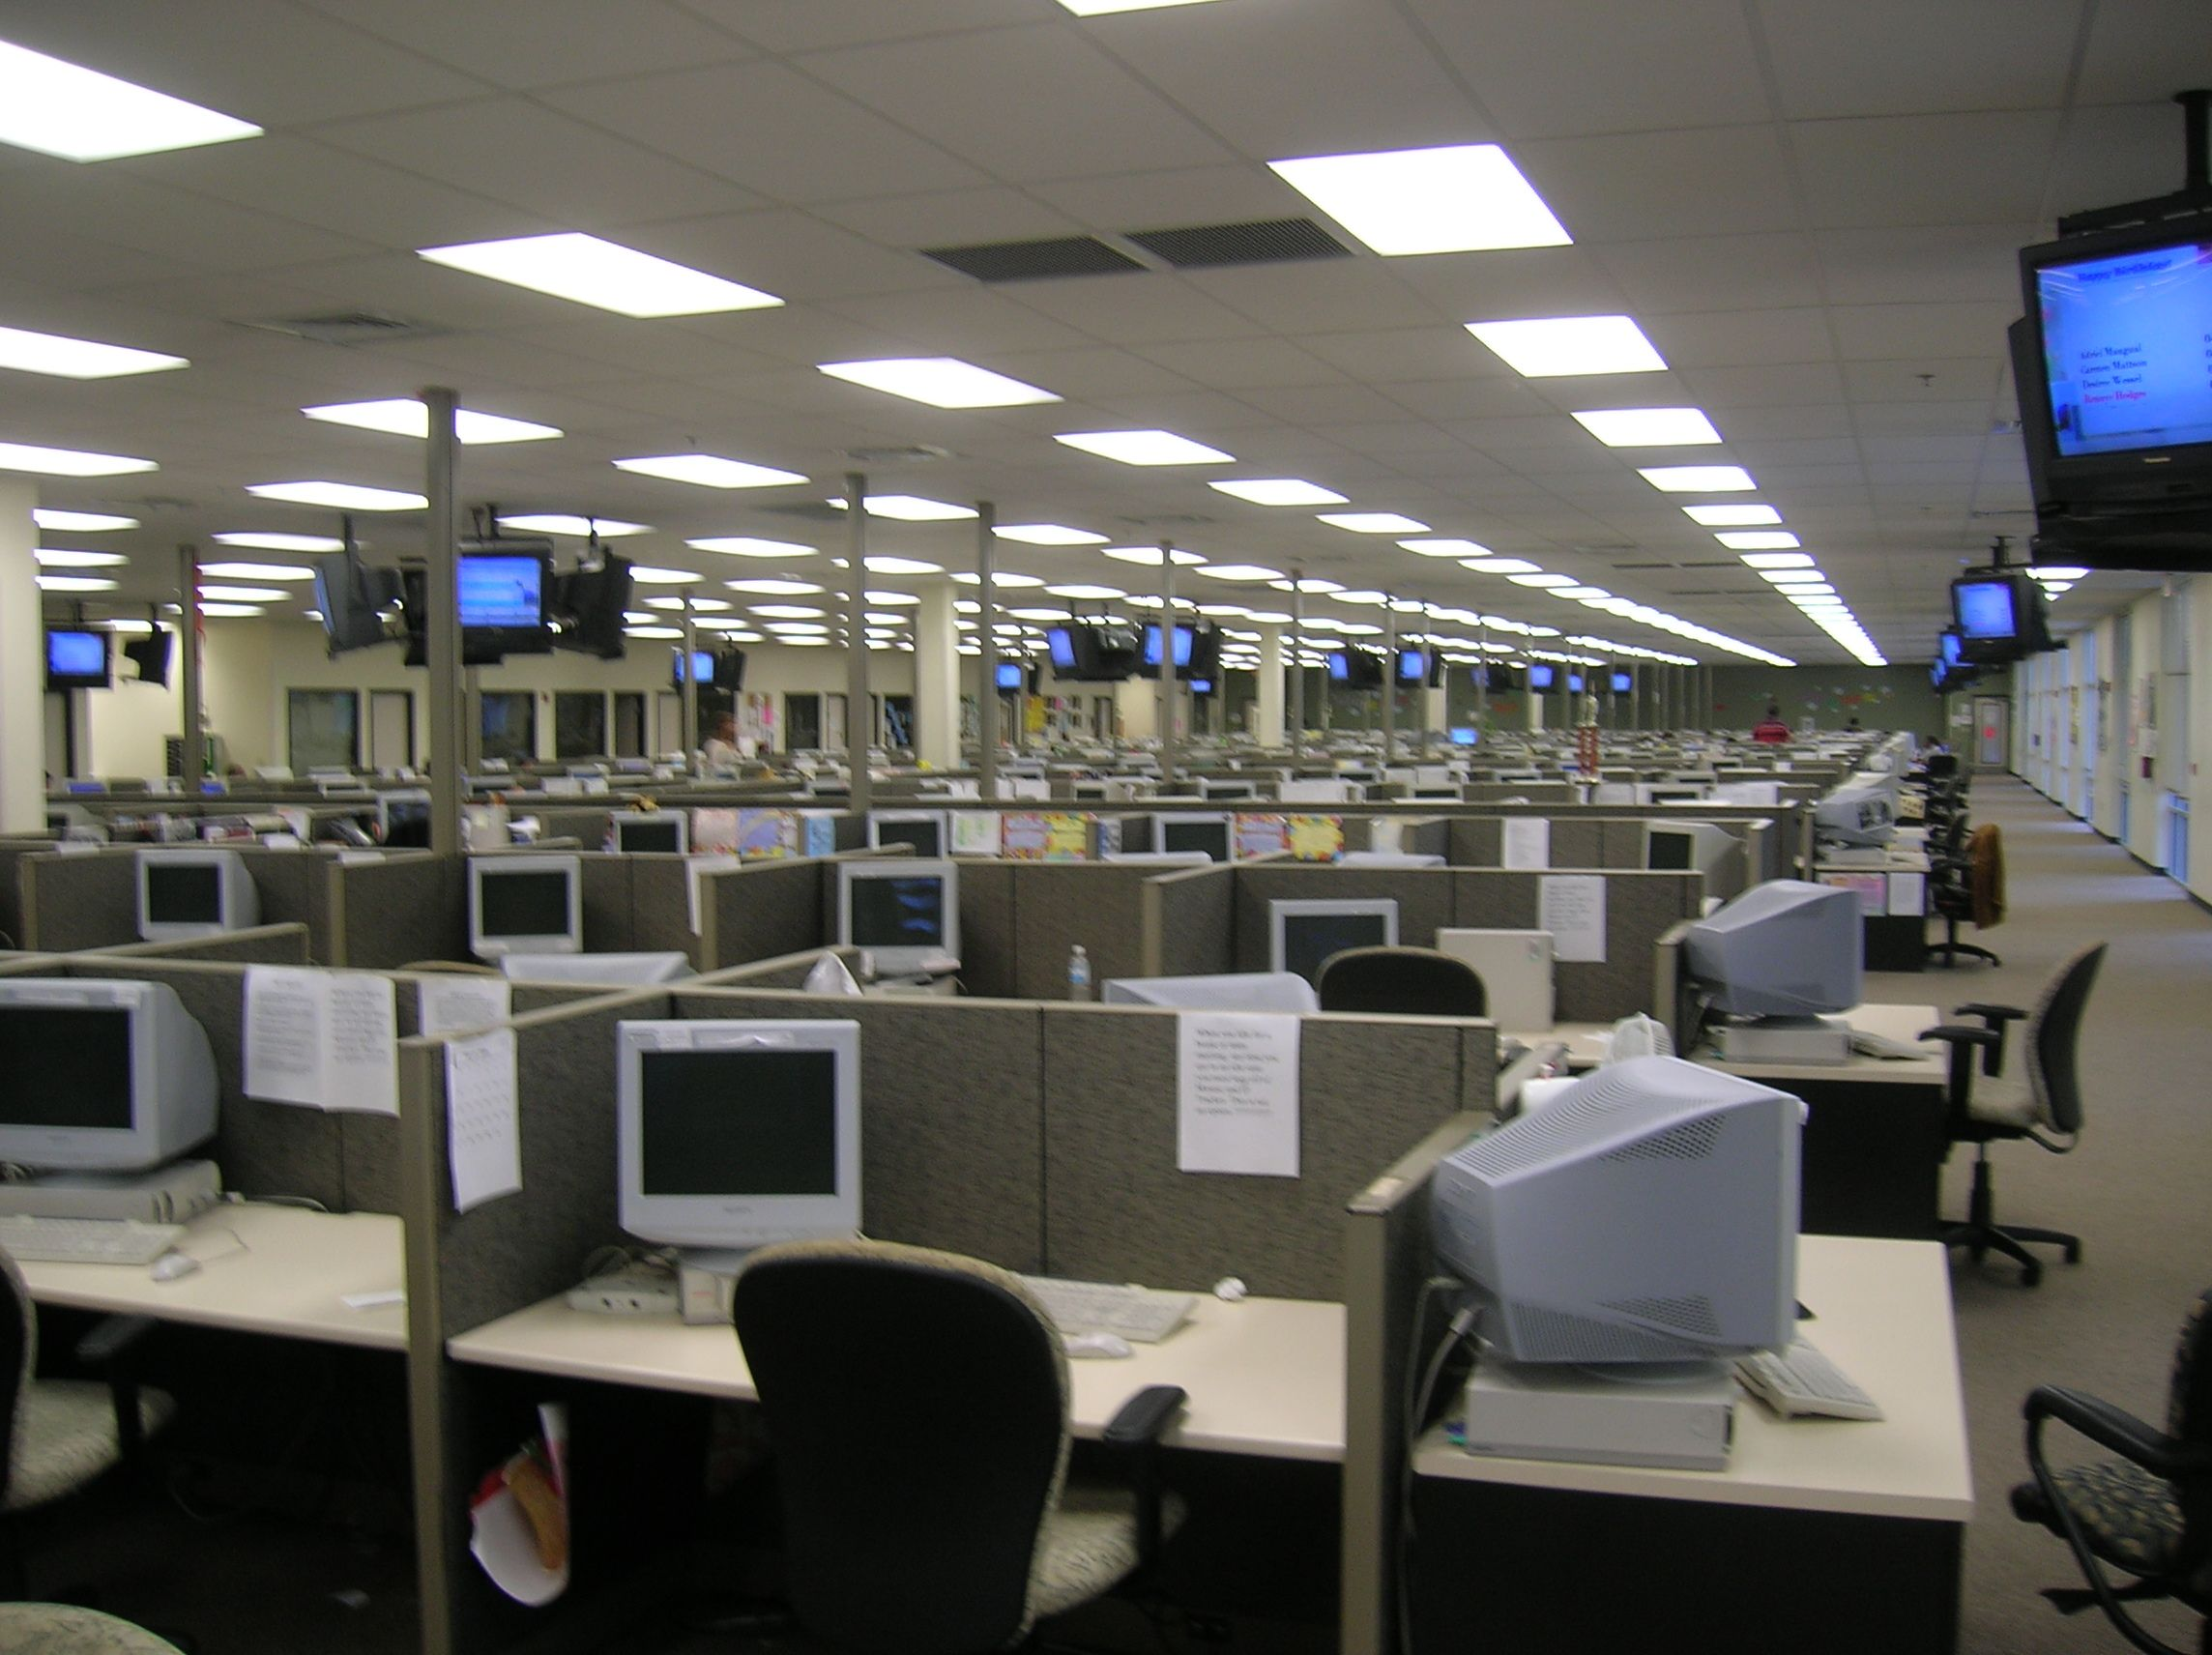 Instalaciones callcenter: Servicios de Metigsa S.L.